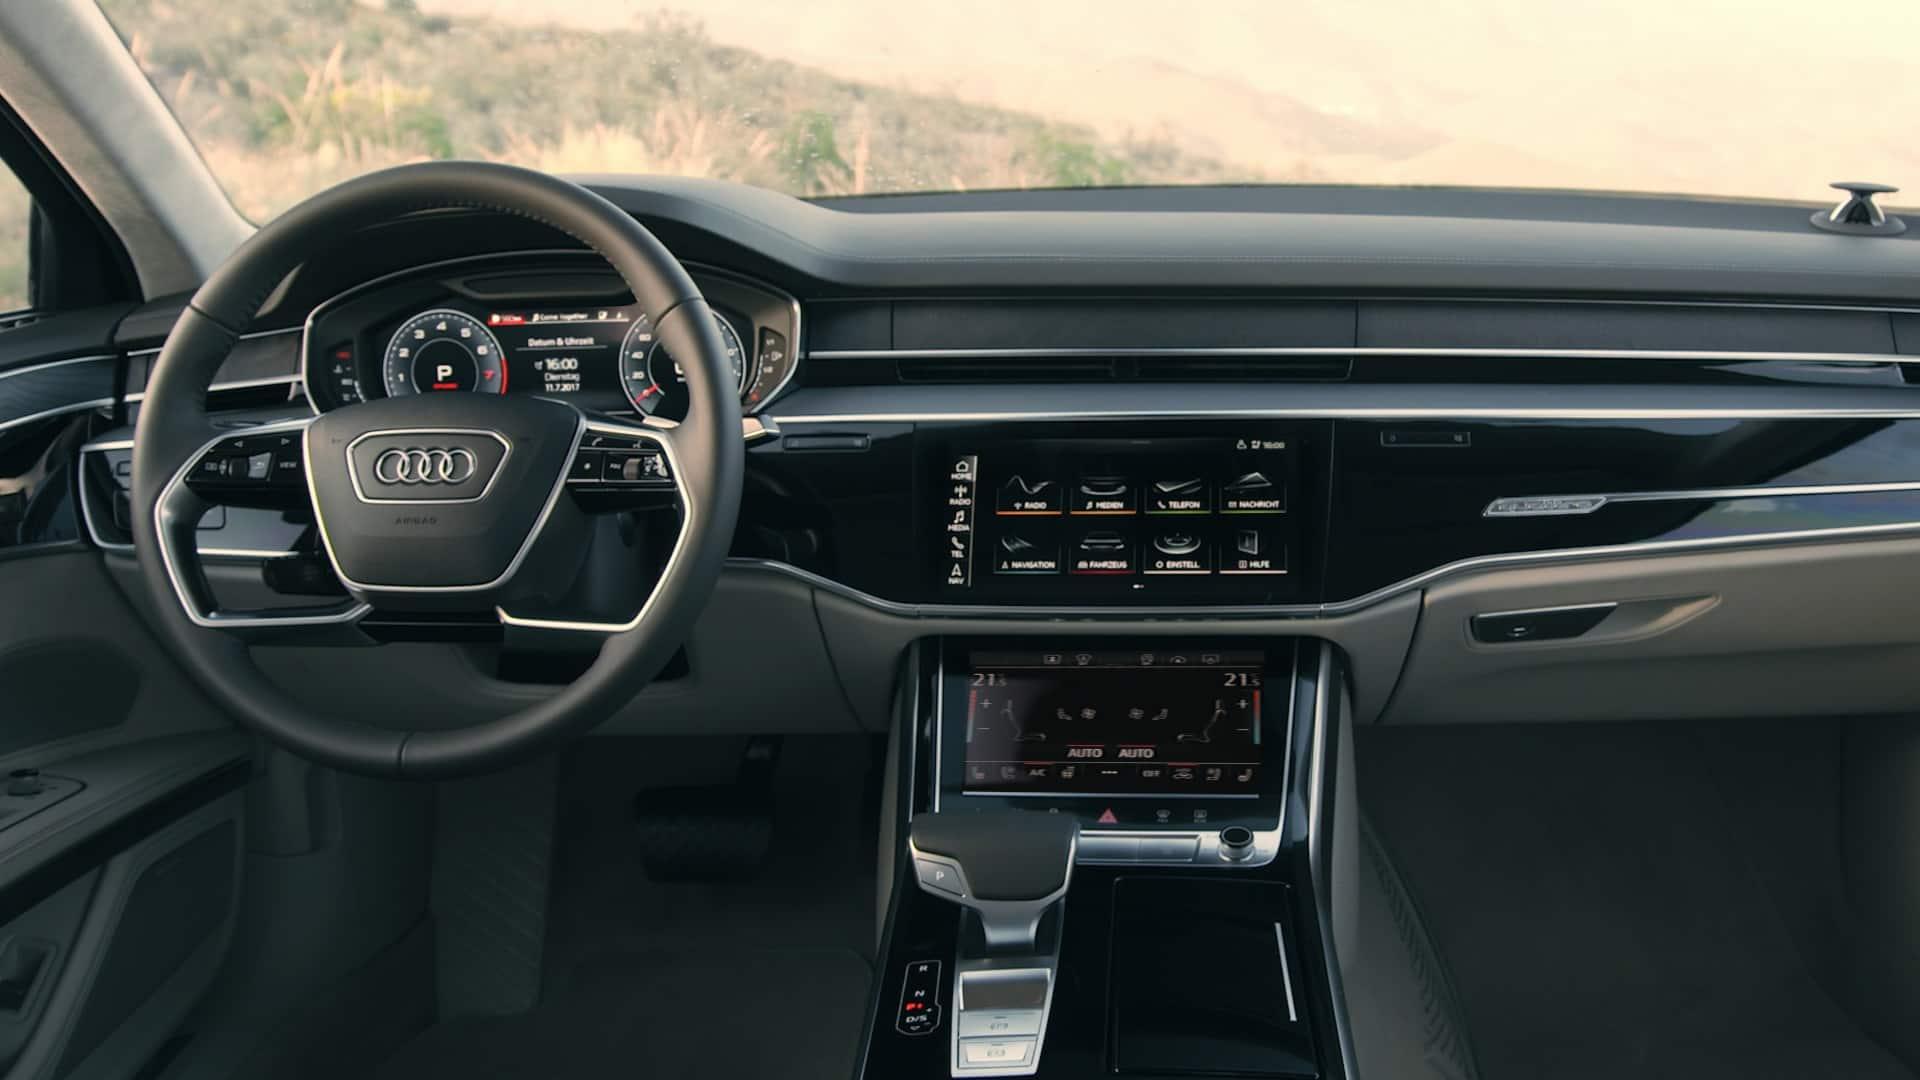 Kekurangan Audi A8 Sportback Spesifikasi